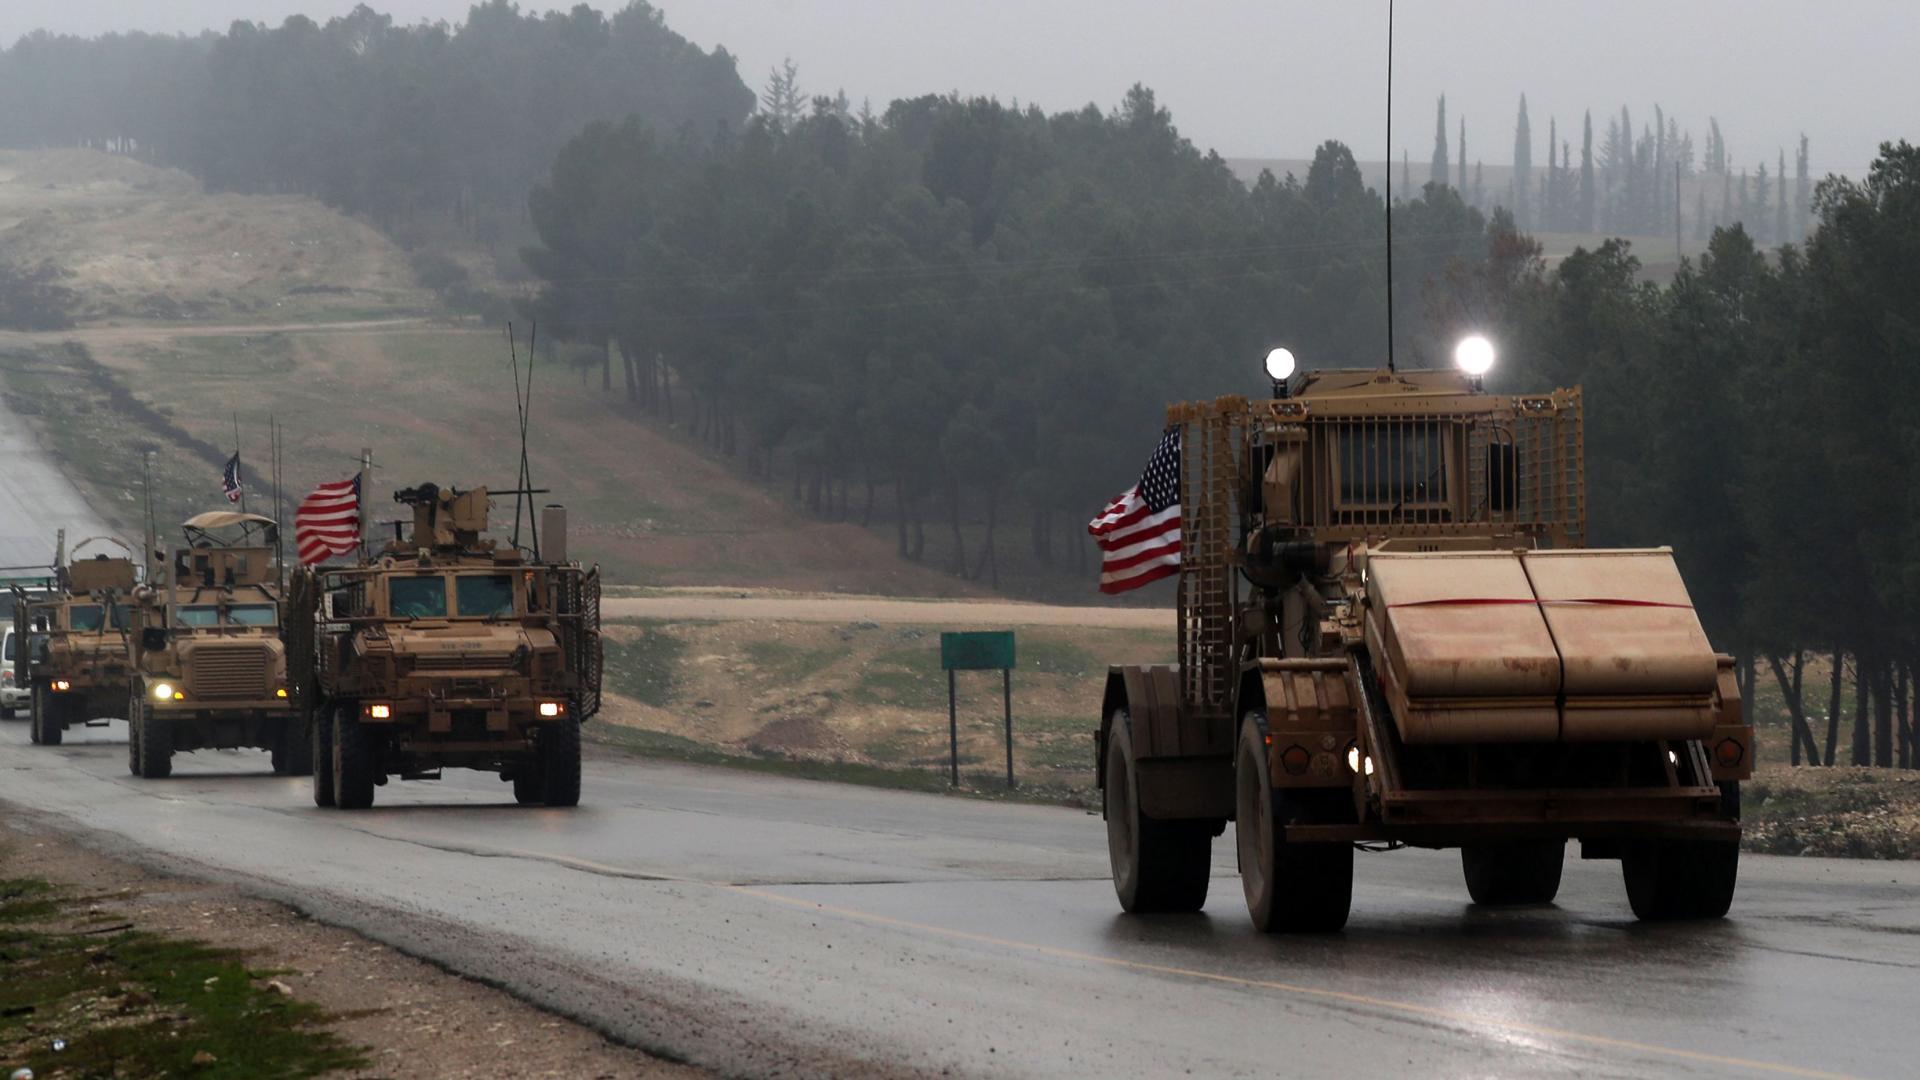 واشنطن: 200 جندي سيبقون في سوريا بعد الانسحاب